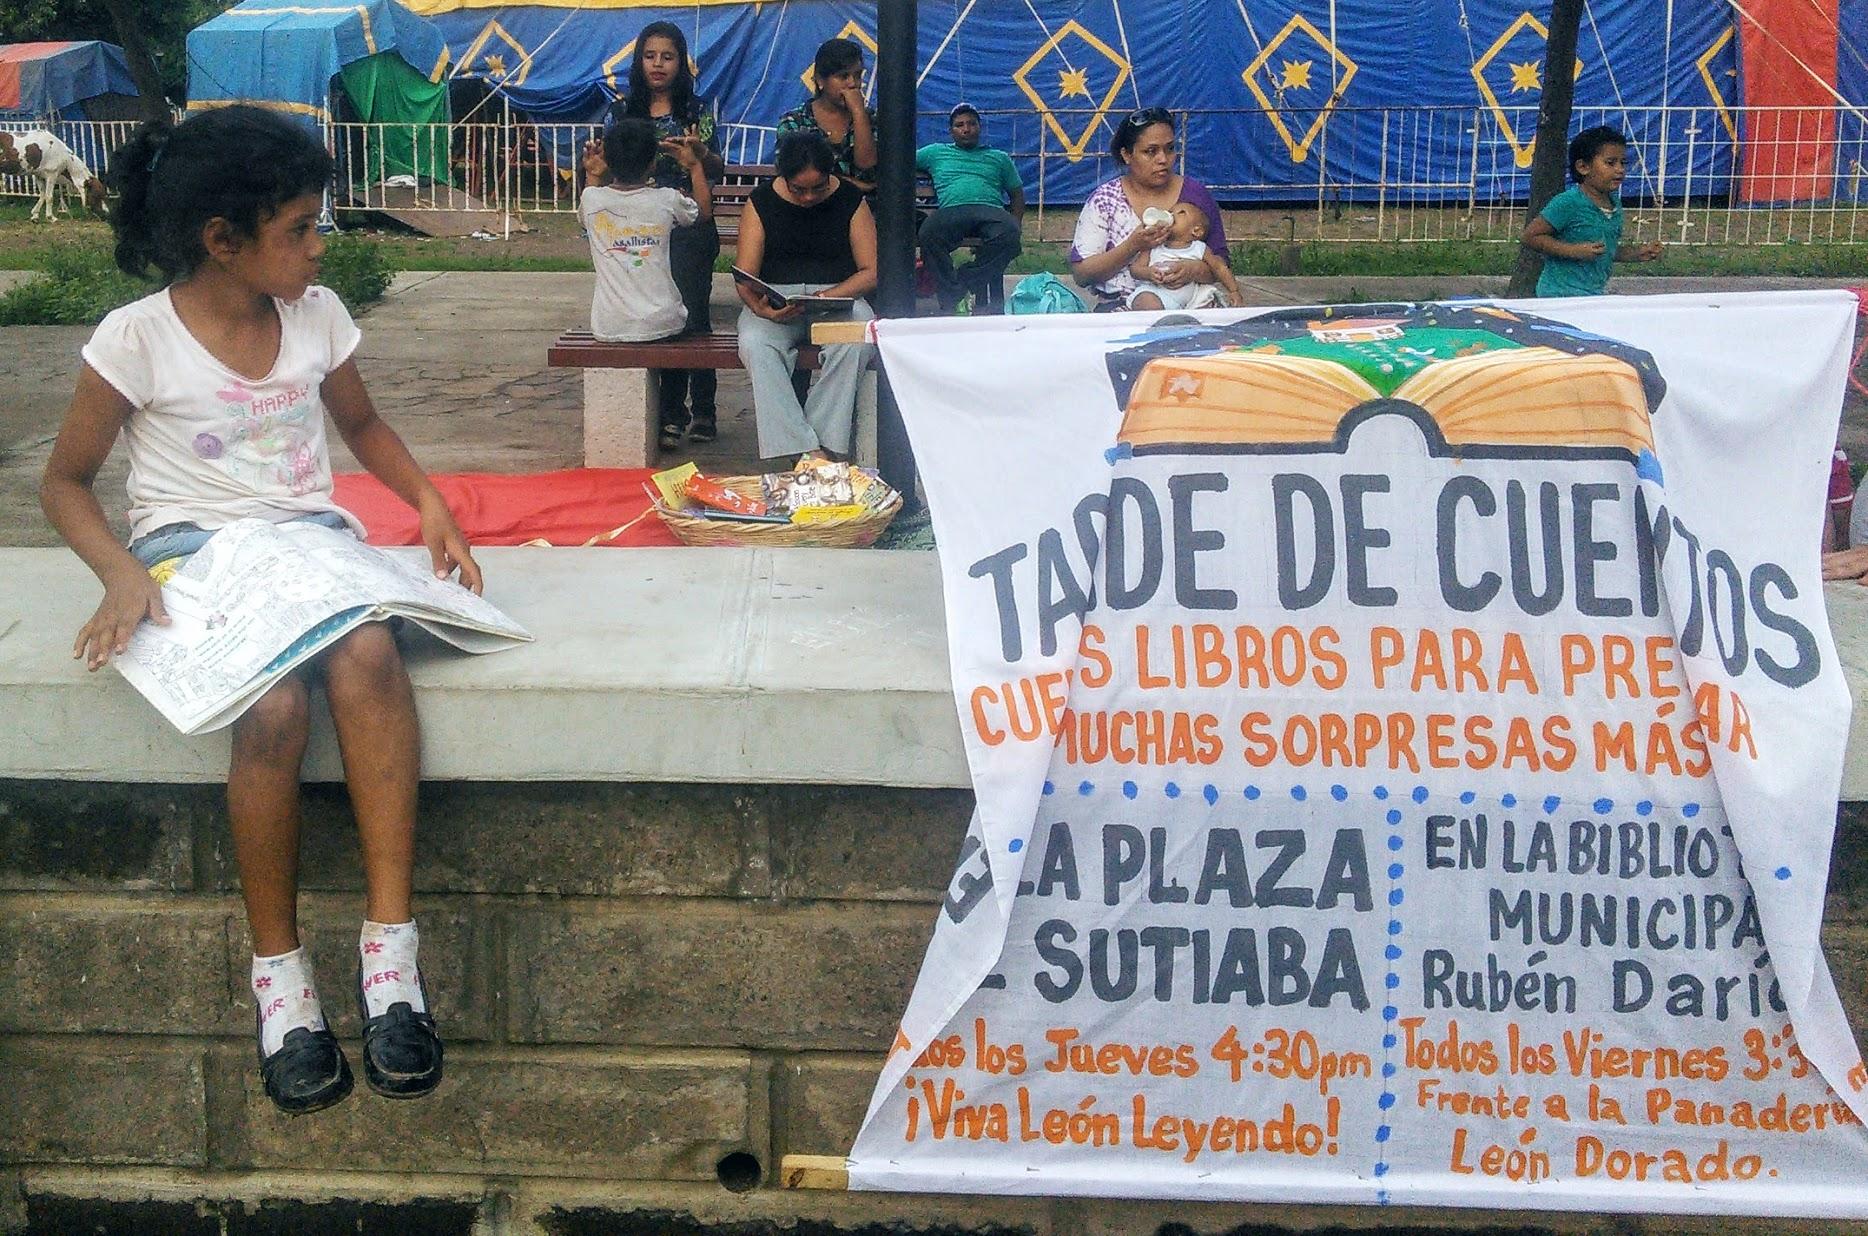 Viva León Leyendo Banner